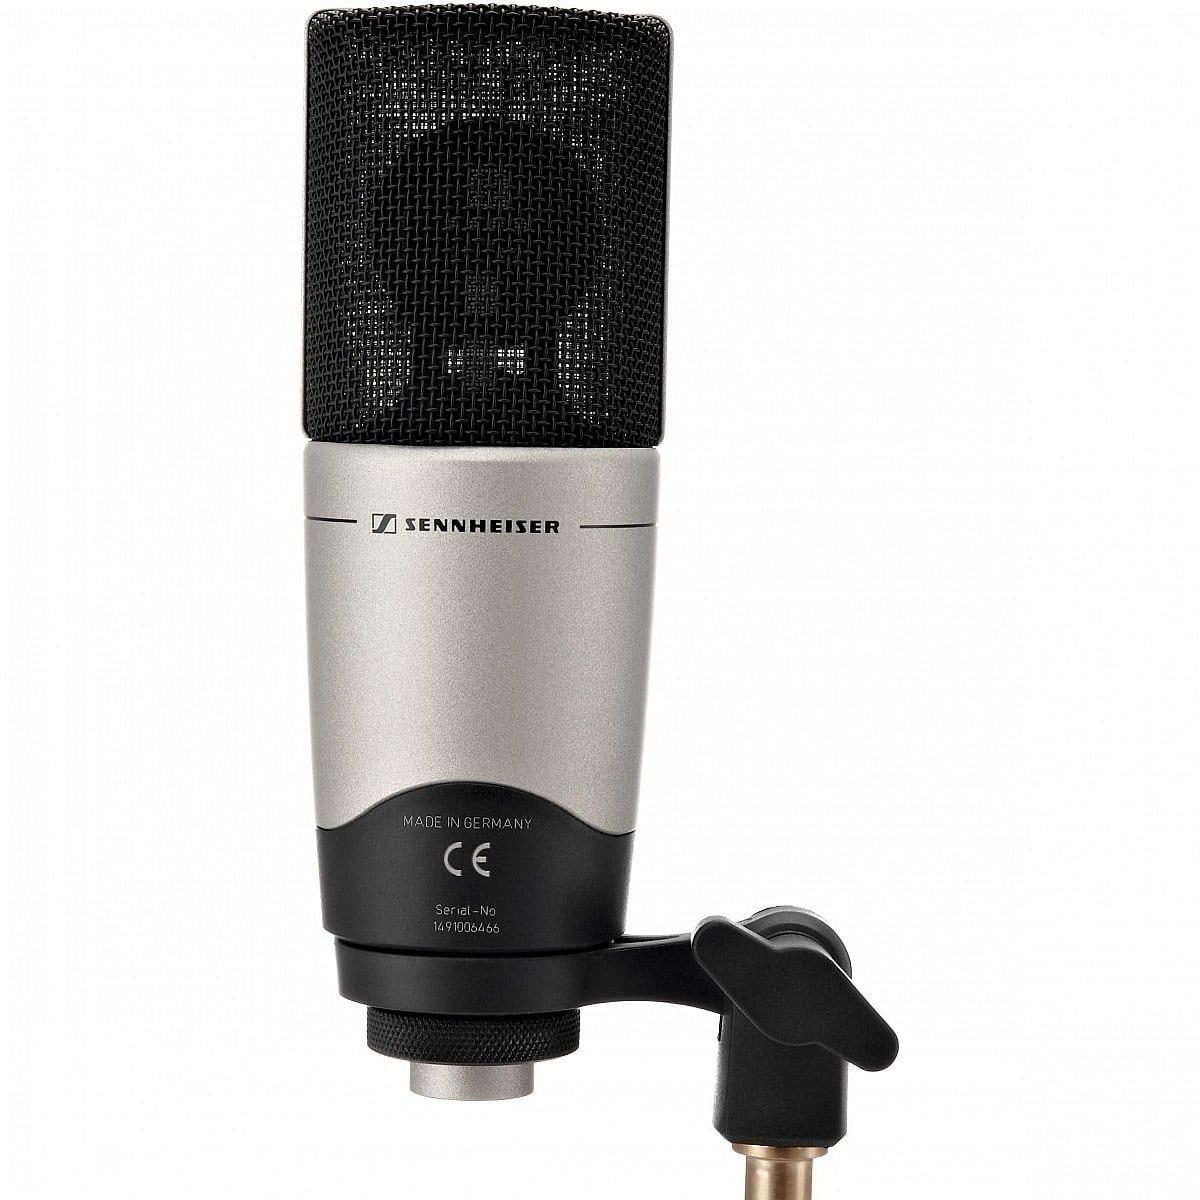 Top 5 gro membrankondensator mikrofone unter 500 euro for Wohnlandschaft unter 500 euro